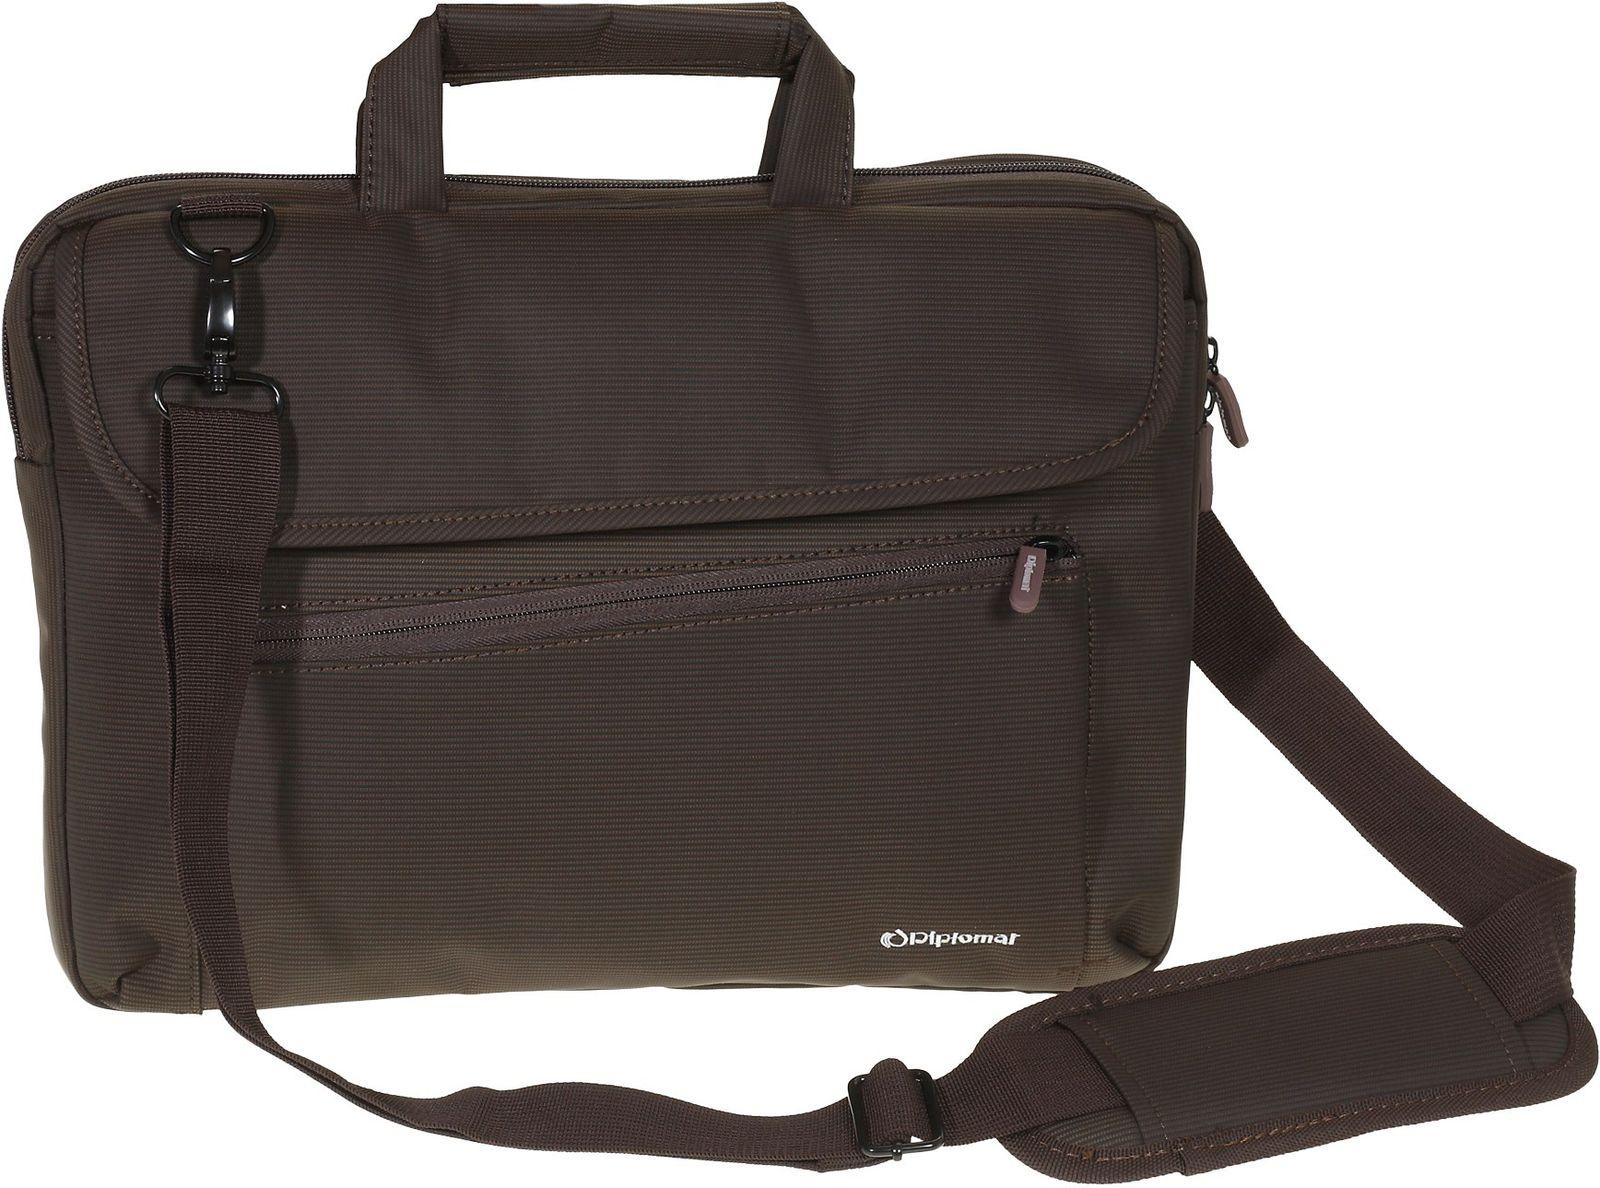 a8f4263d3c Τσάντα Ώμου Laptop 15 Diplomat LC855